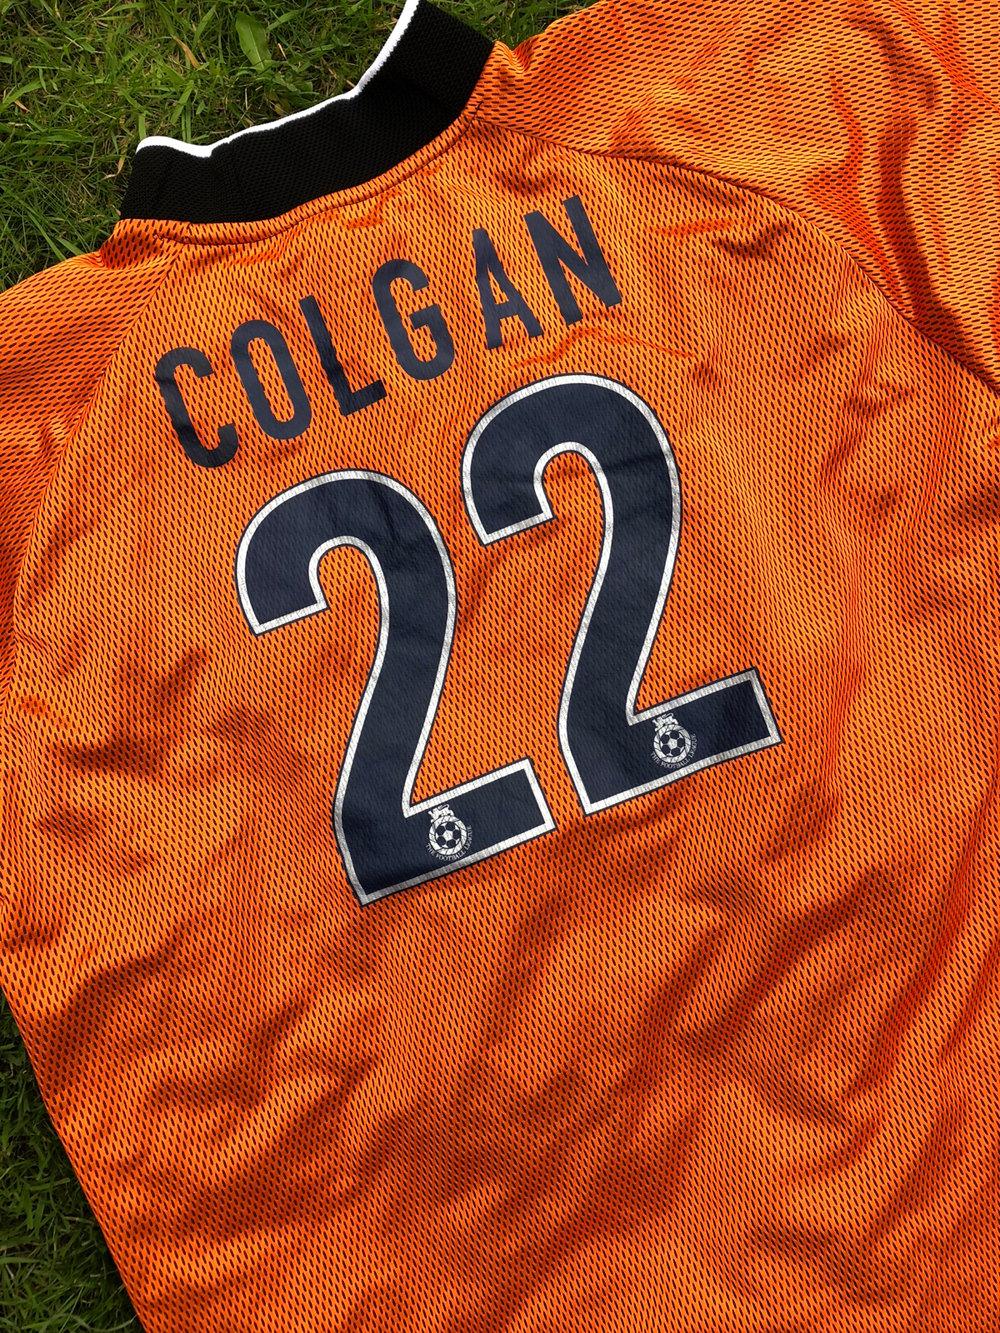 Match worn 2003/04 Nick Colgan goalkeeper shirt